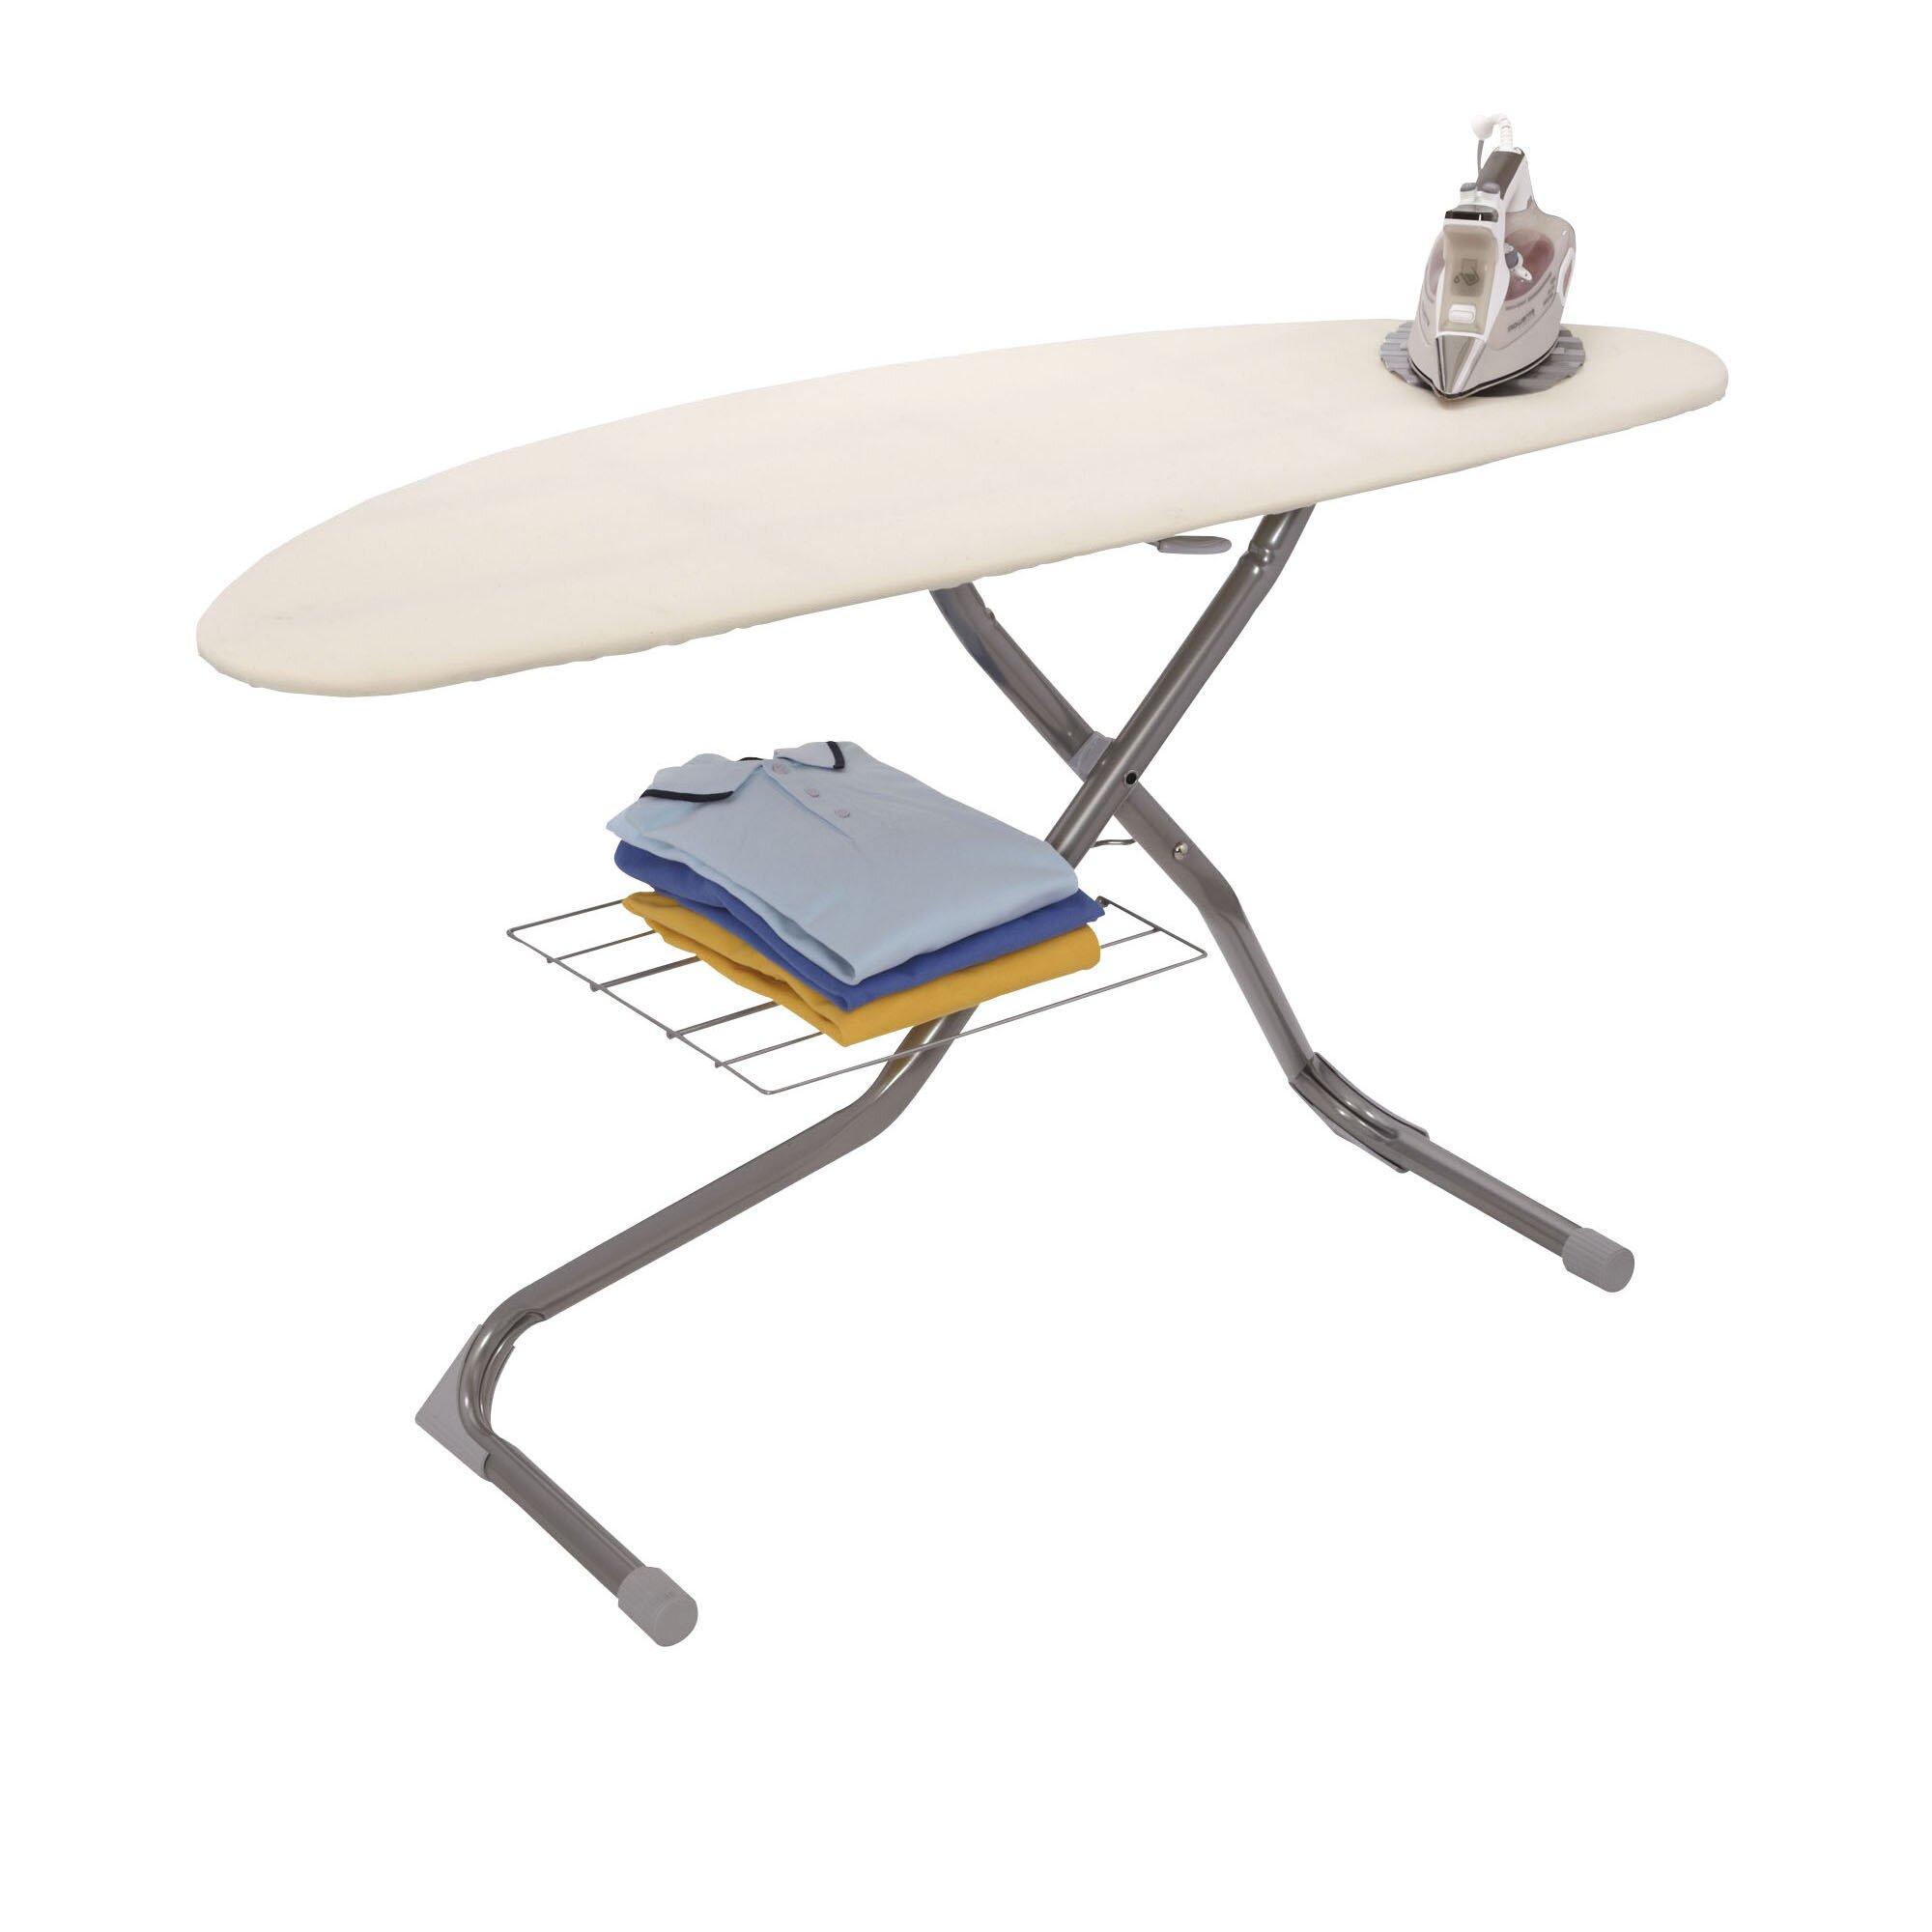 italian fiberglass ironing board covers